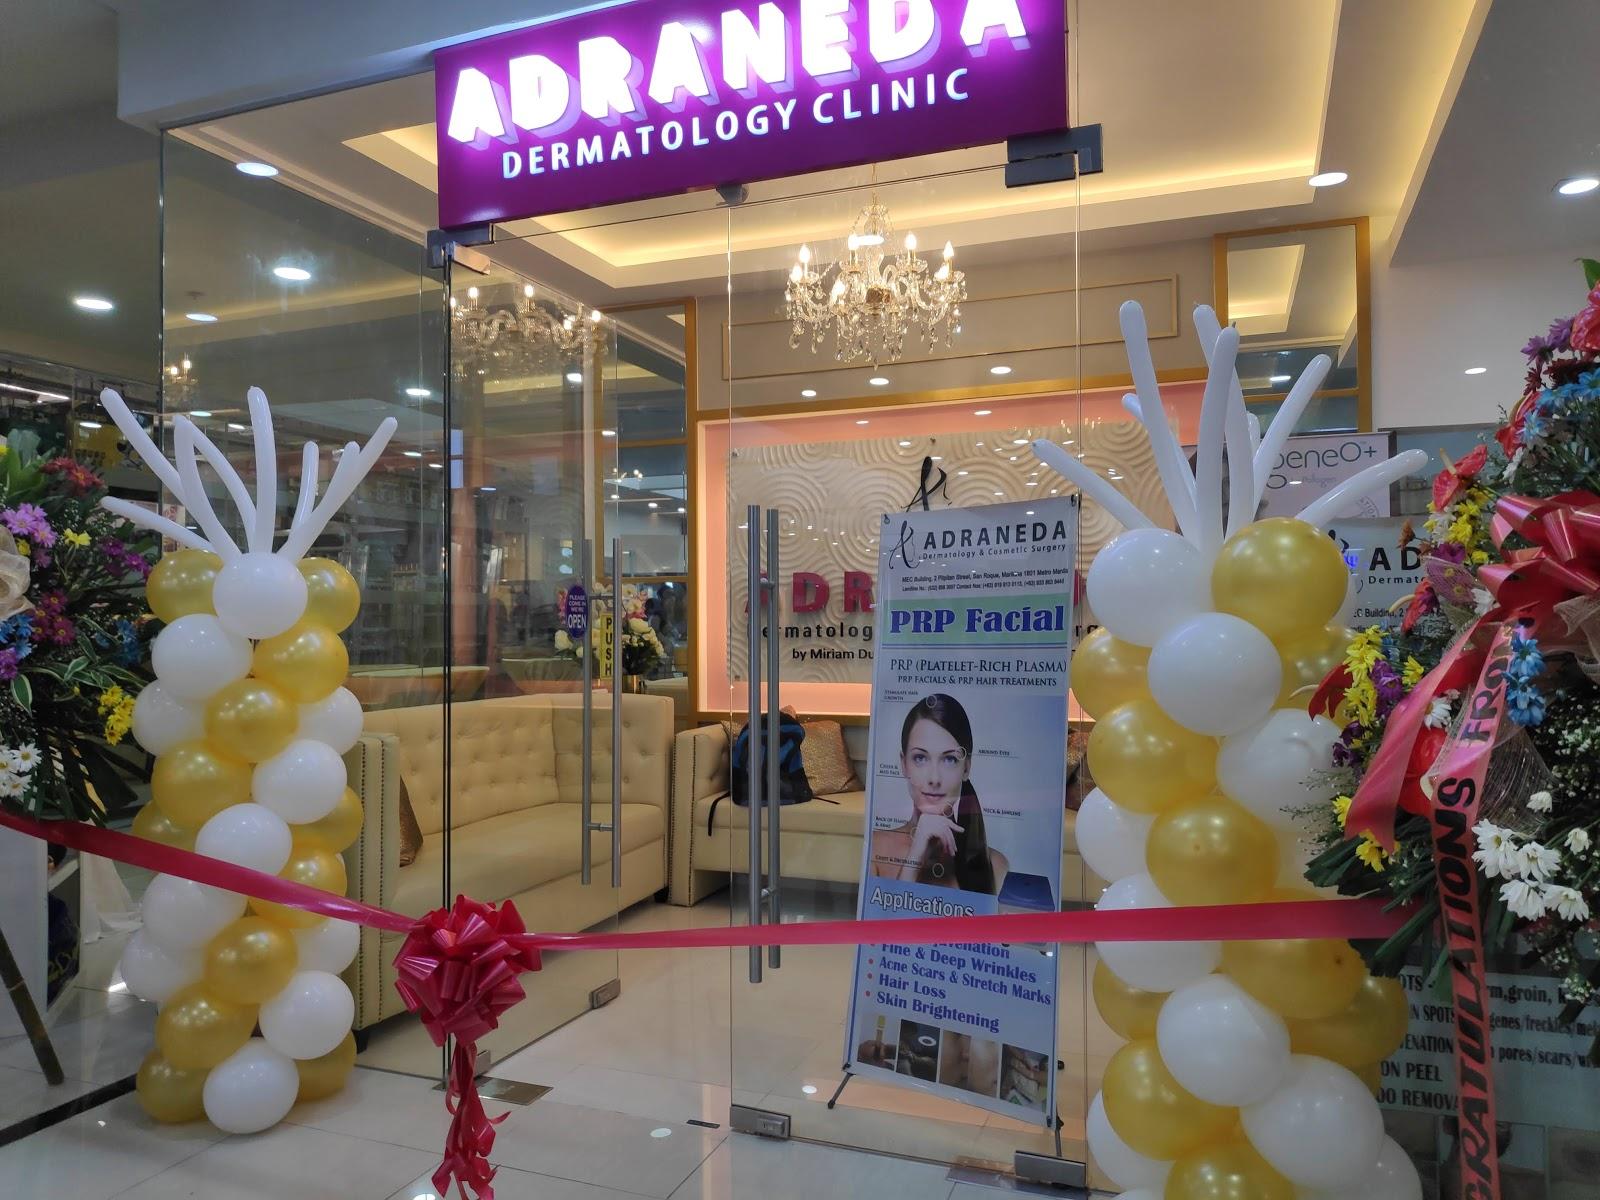 Adraneda Dermatology Clinic | A BEAUTY BELLA